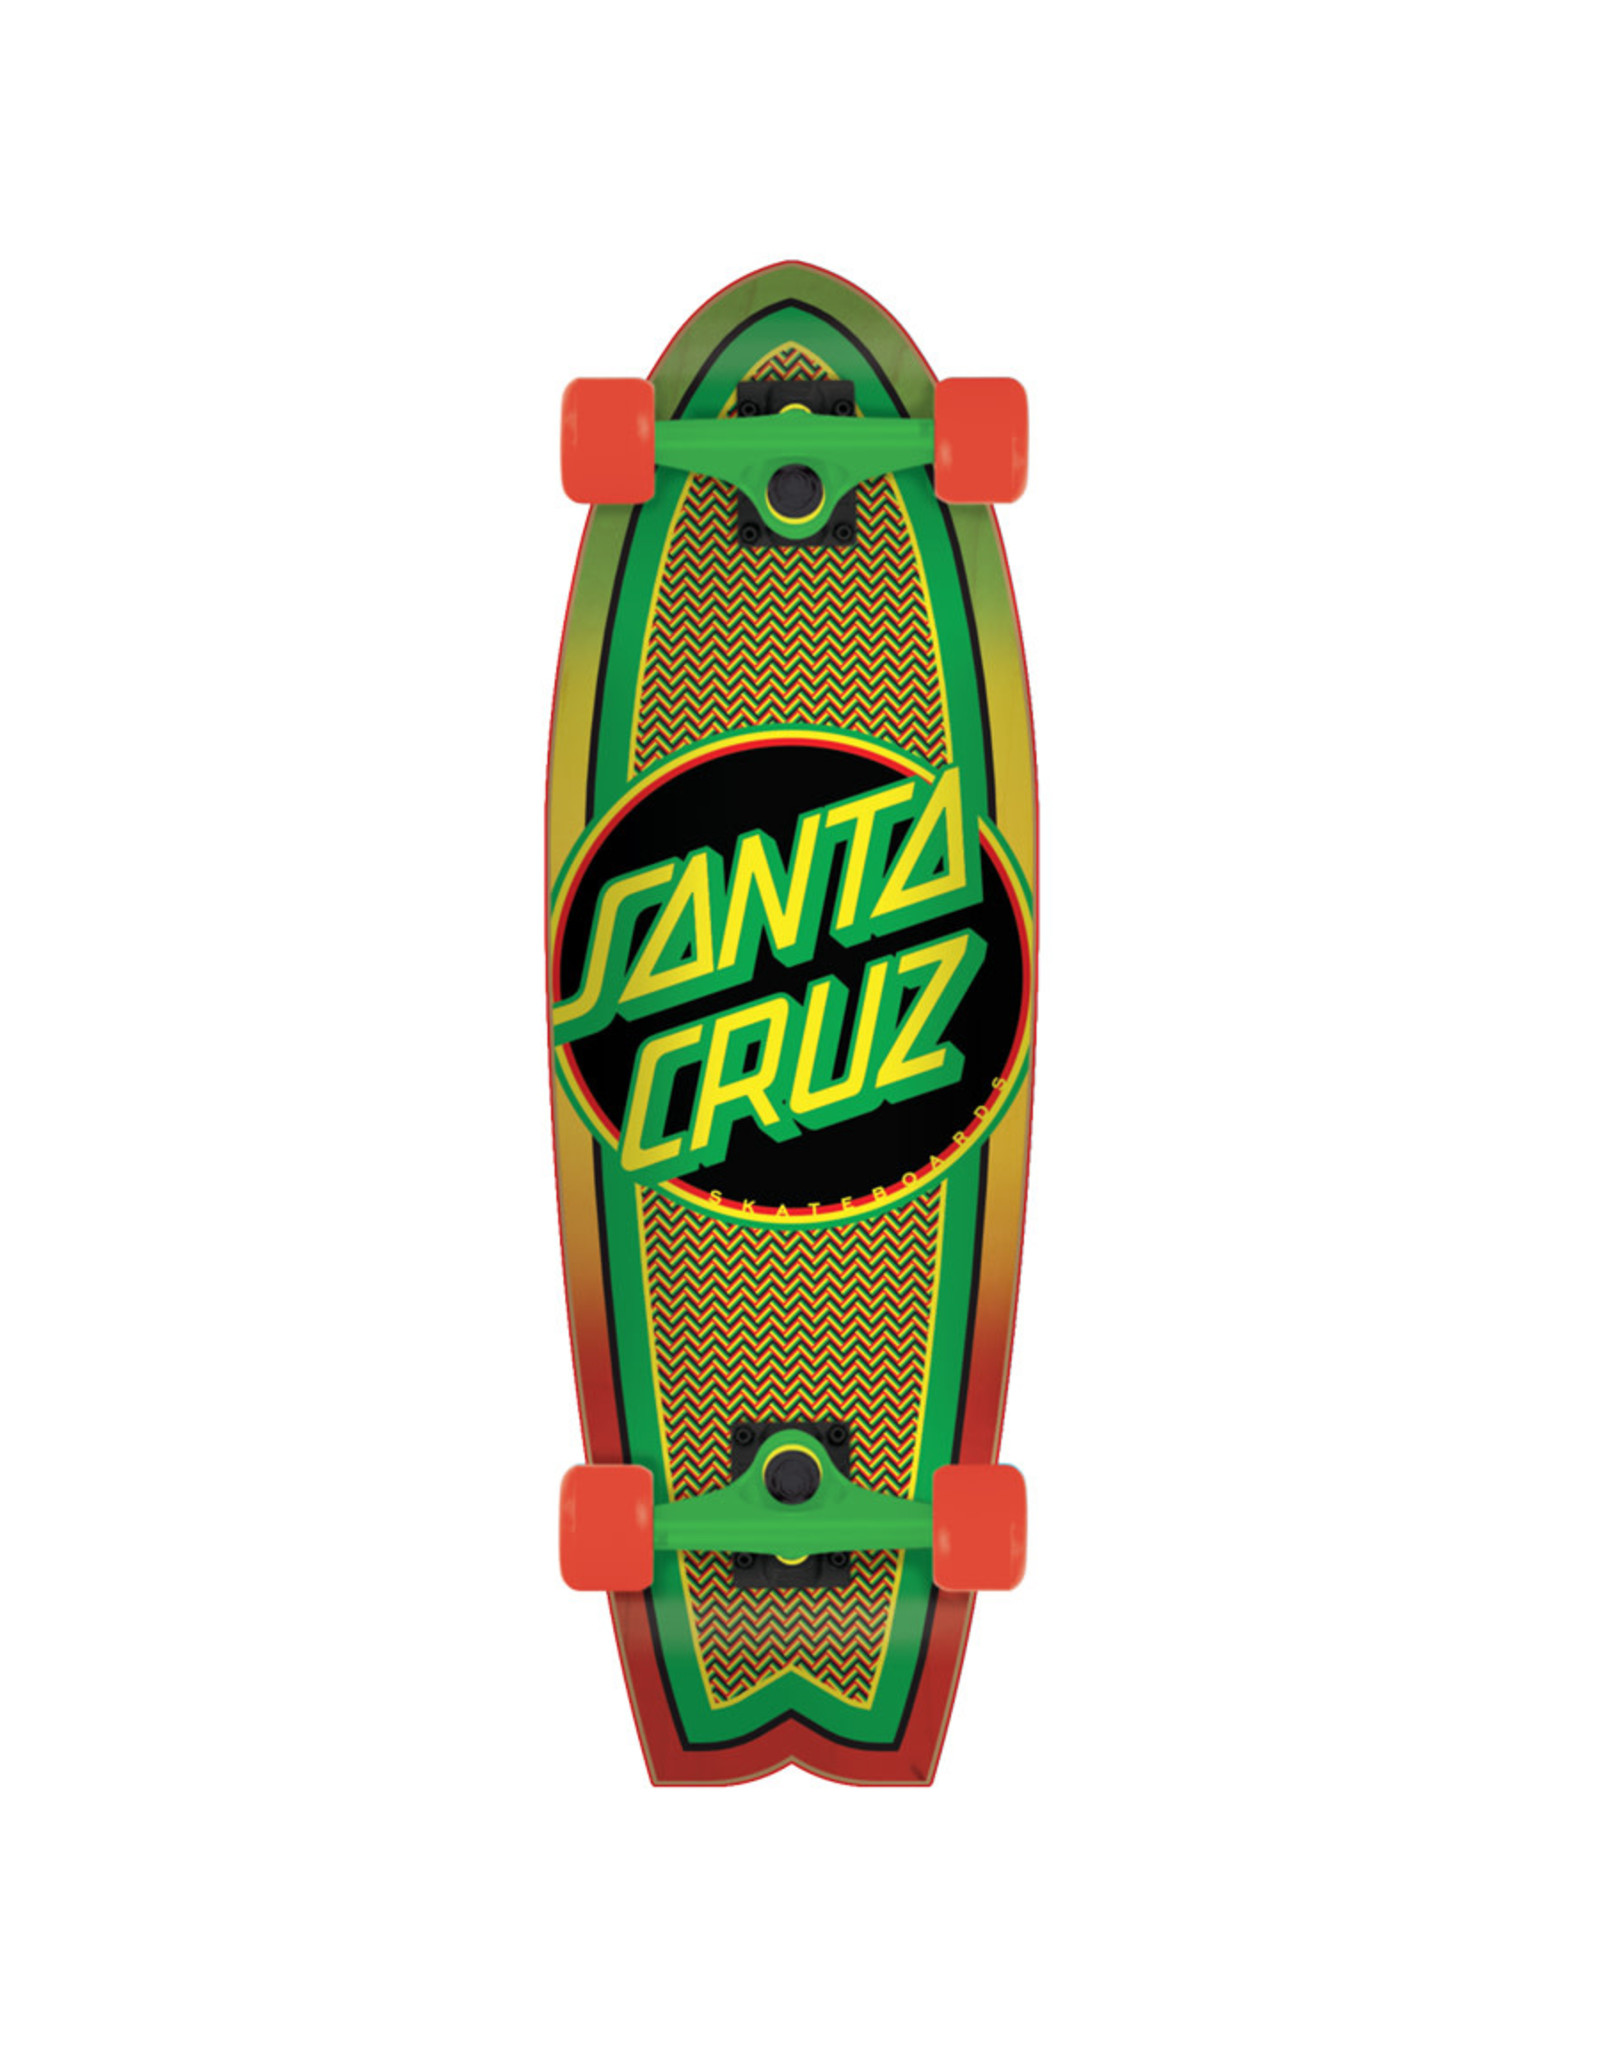 Santa Cruz Santa Cruz Complete Rasta Weave Dot Shark Cruzer (8.8)